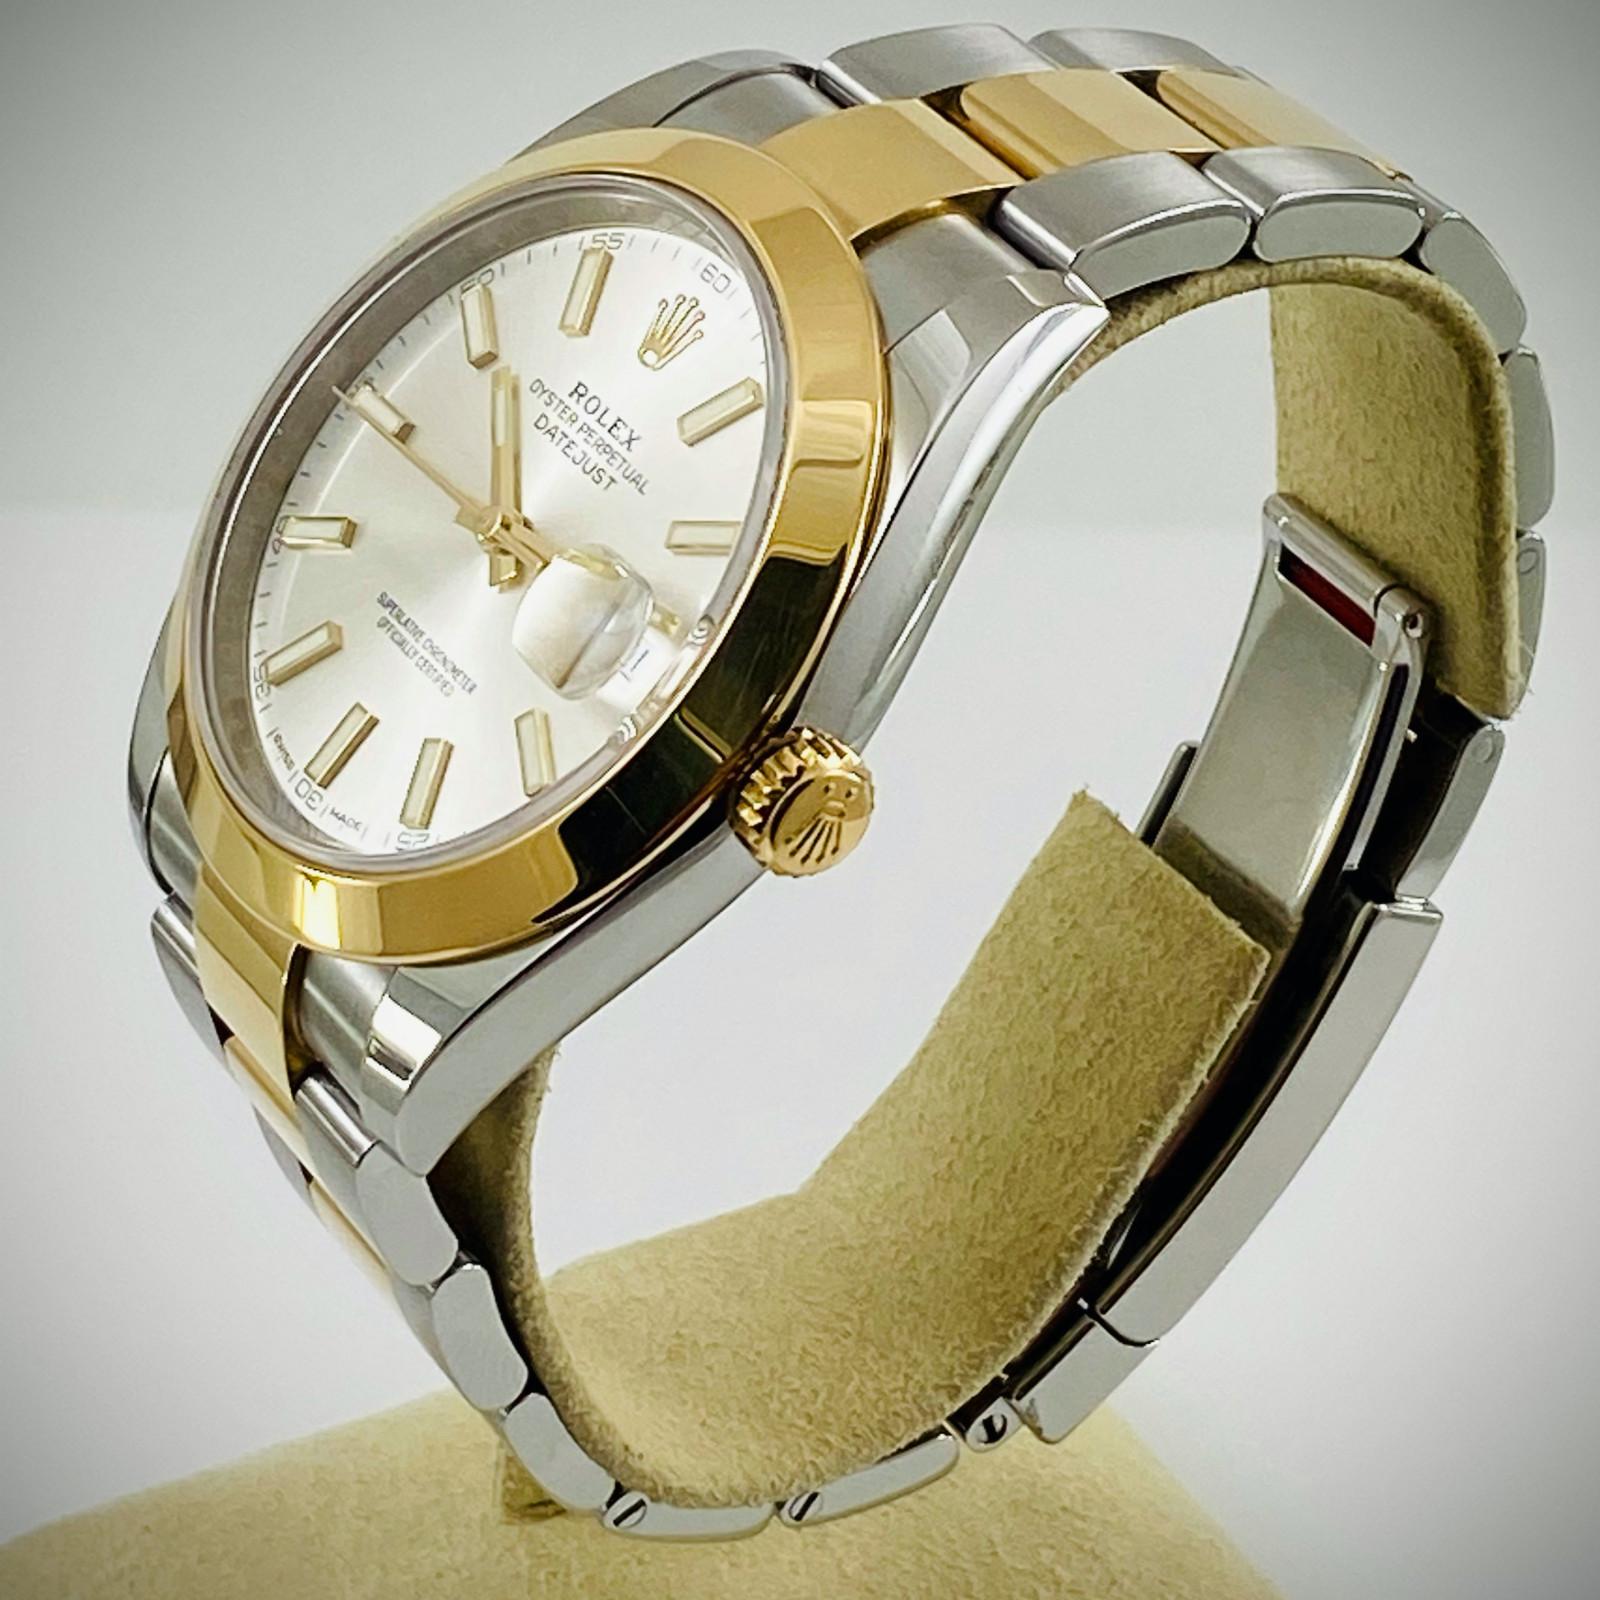 2018 Rolex Datejust 41 126303